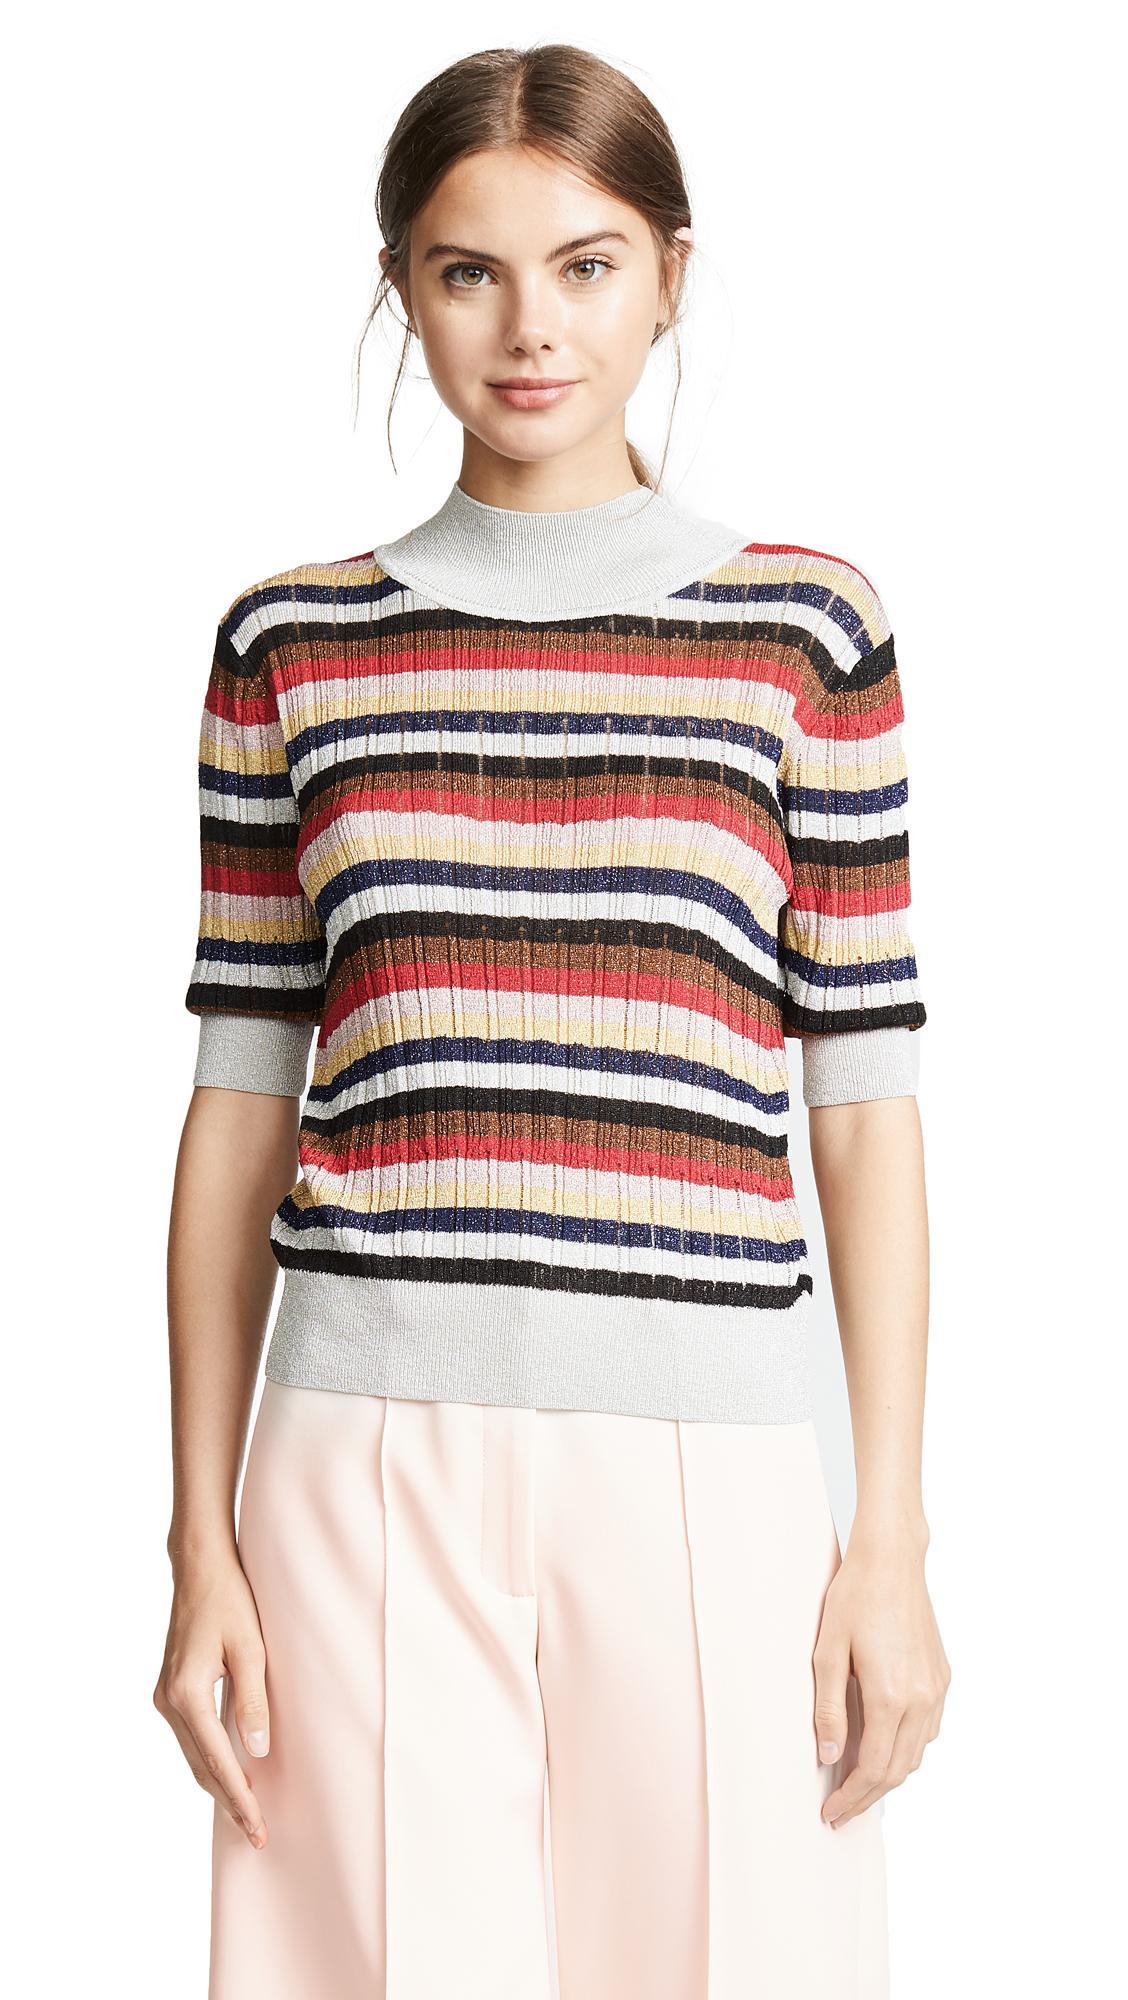 32dd63b036e74 Sonia Rykiel Multicolor Striped Knit Top In Metallic